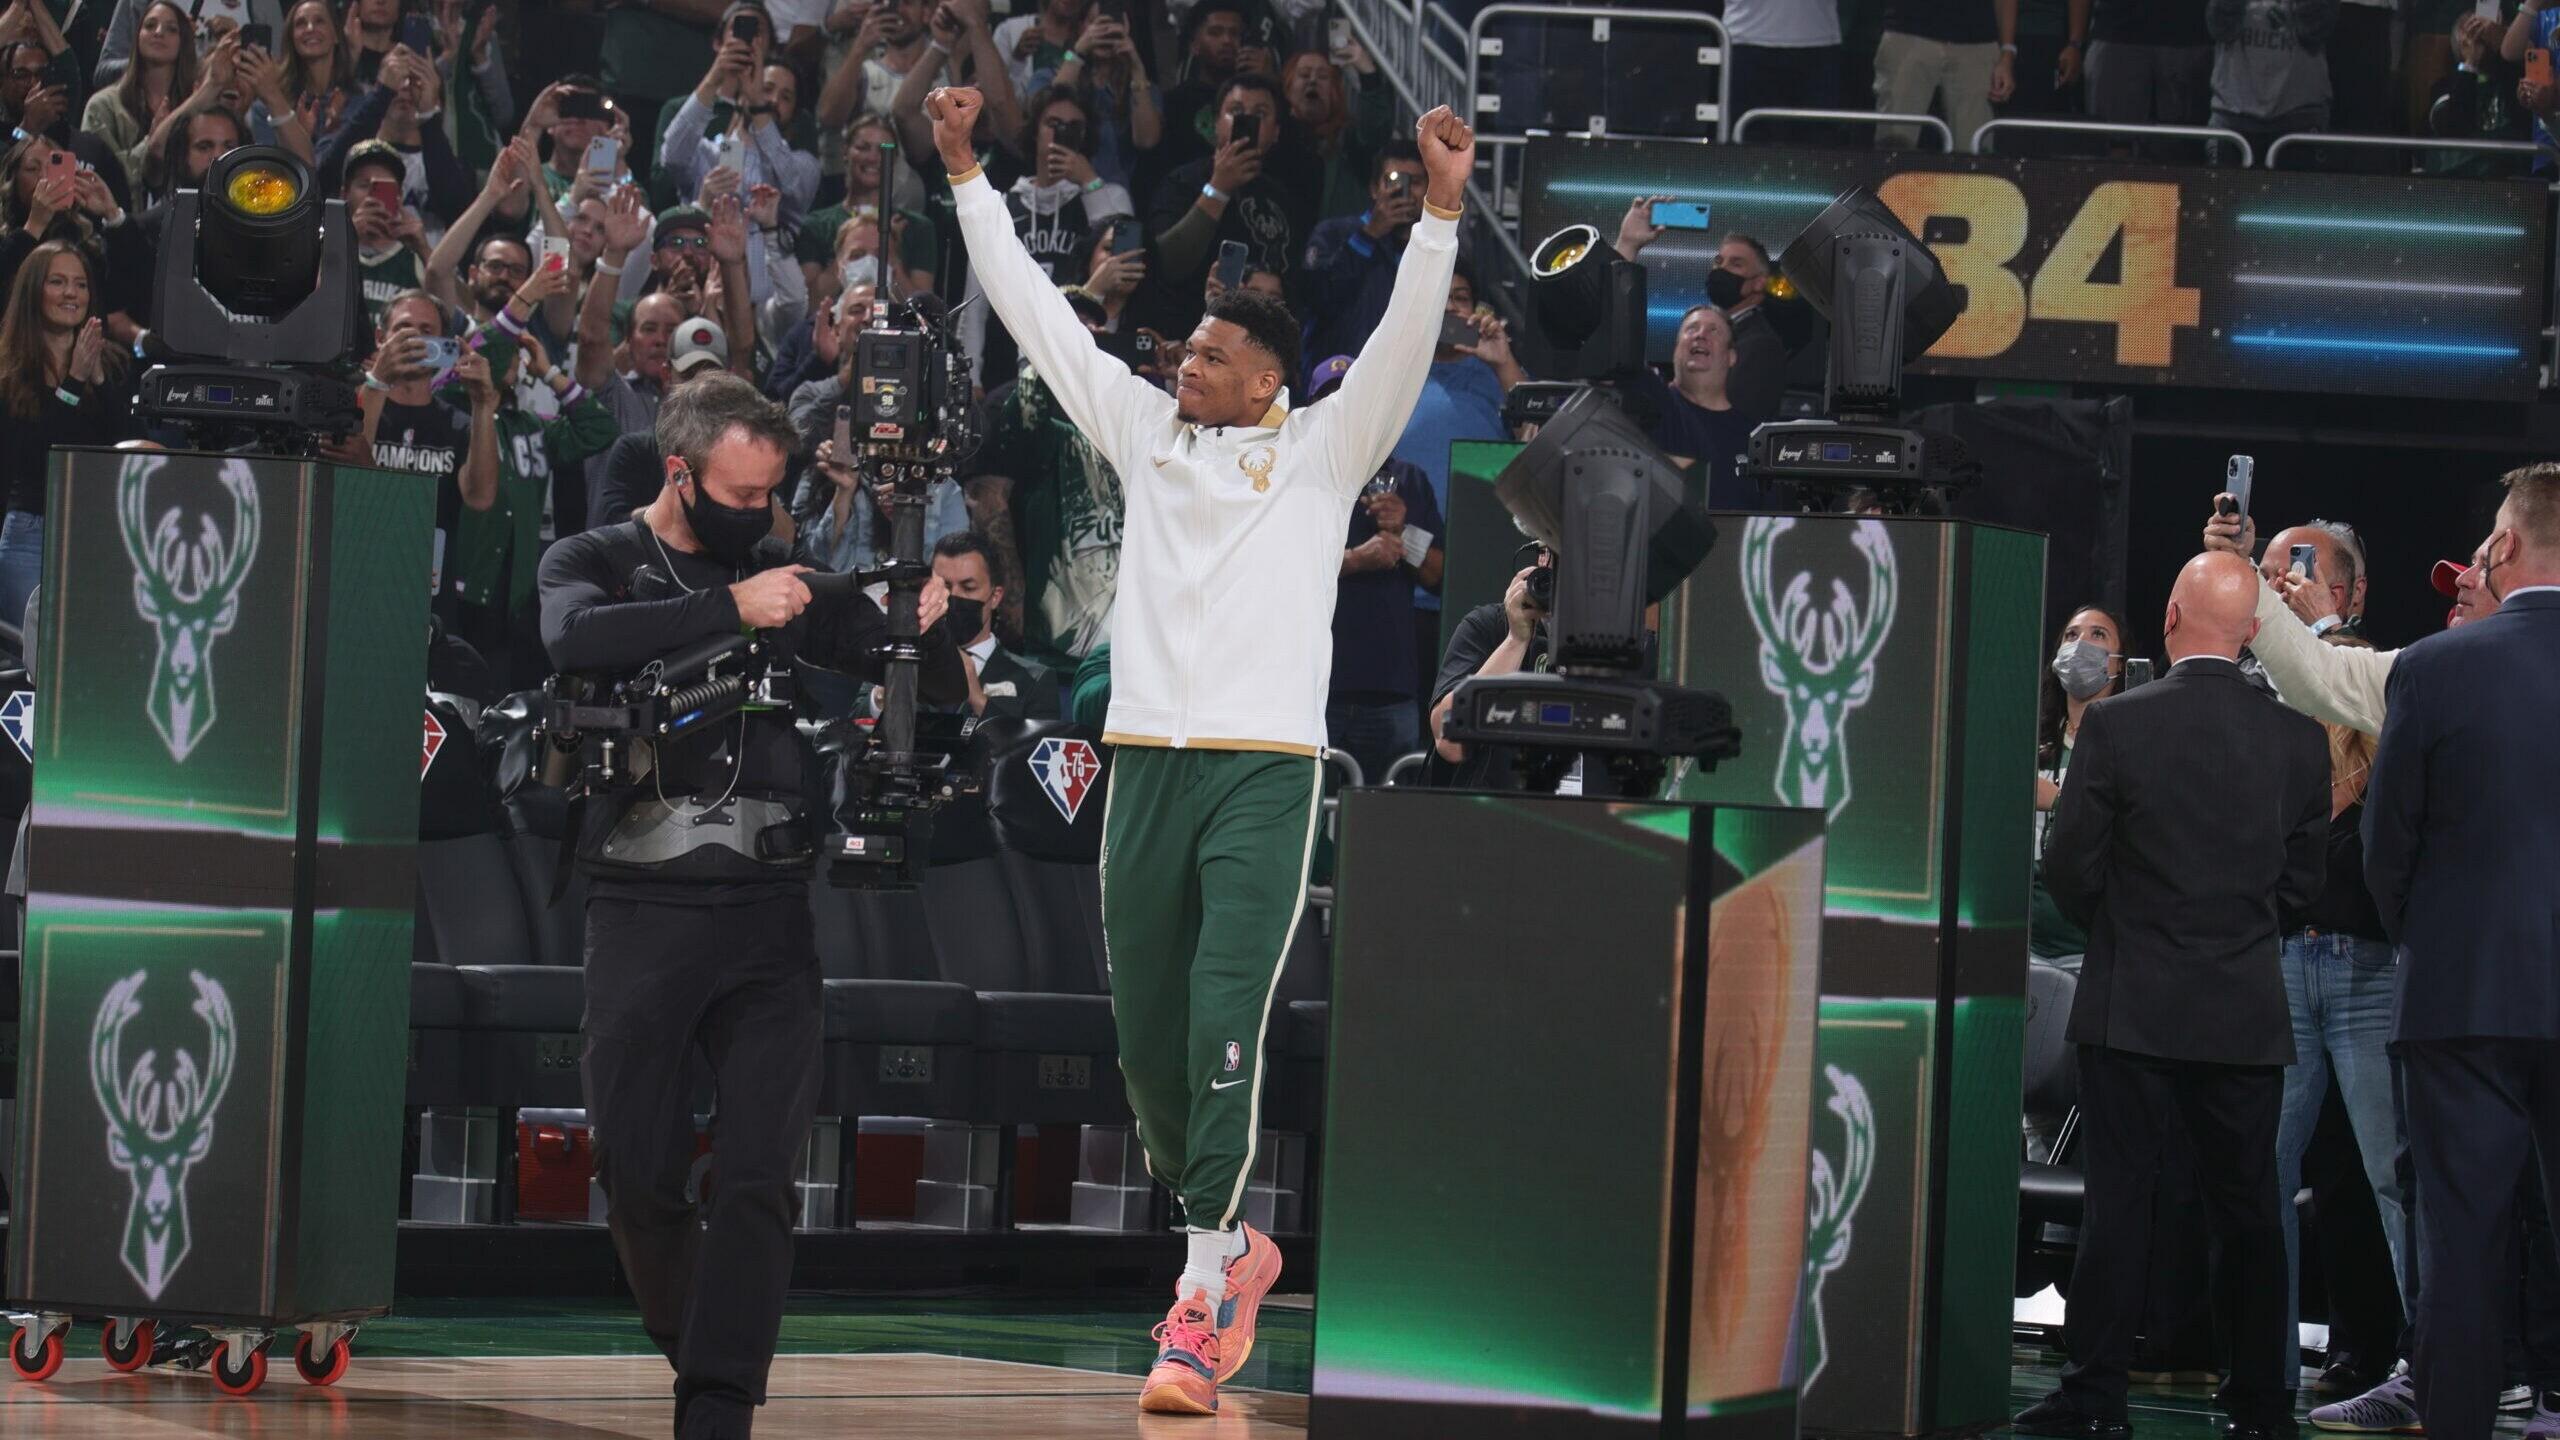 Bucks end championship chapter, enter title defense era